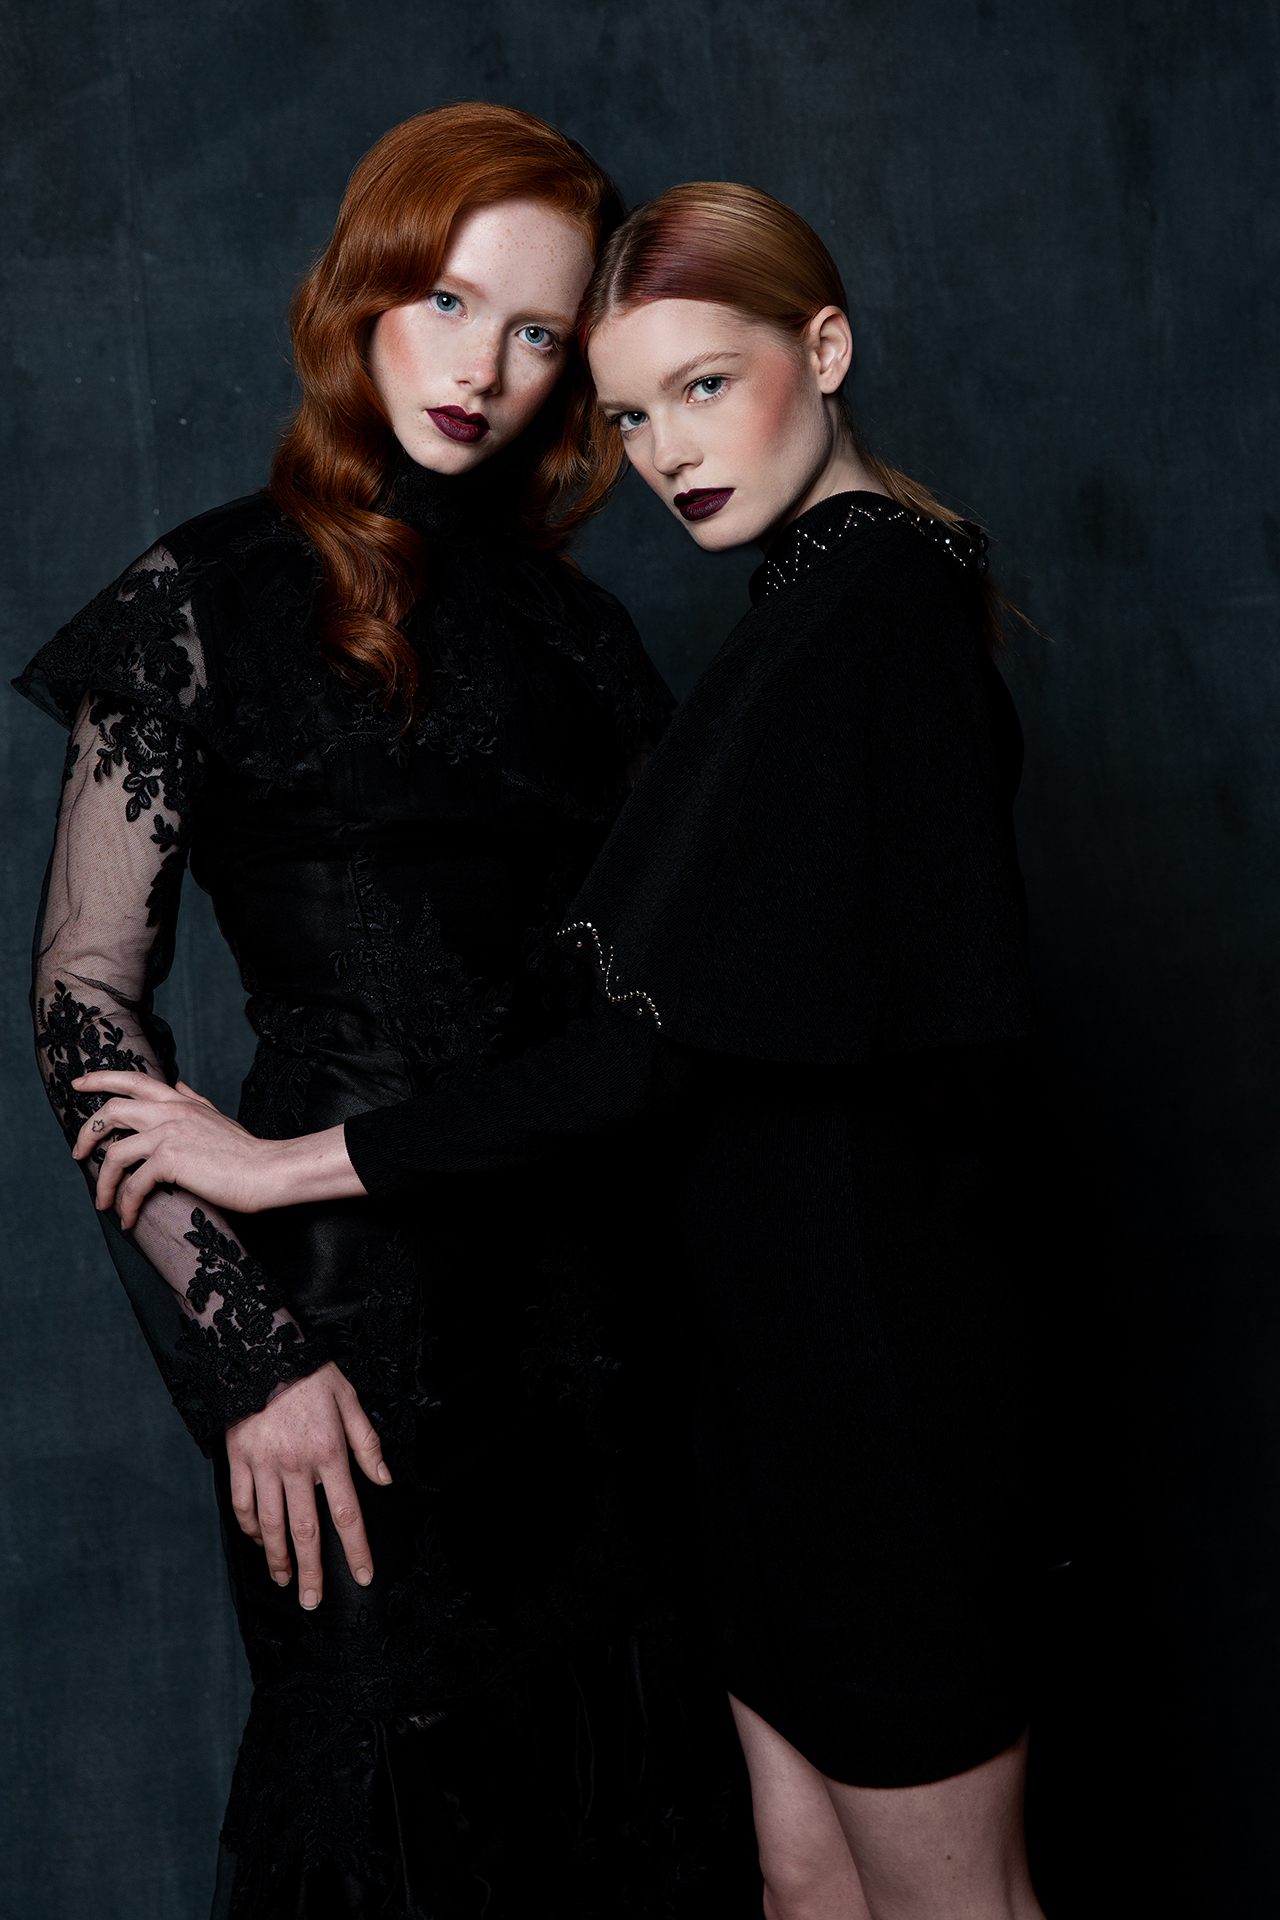 mark_and_naomi_toronto_fashion_photography_david_dunkley_black_tie_iv.jpg